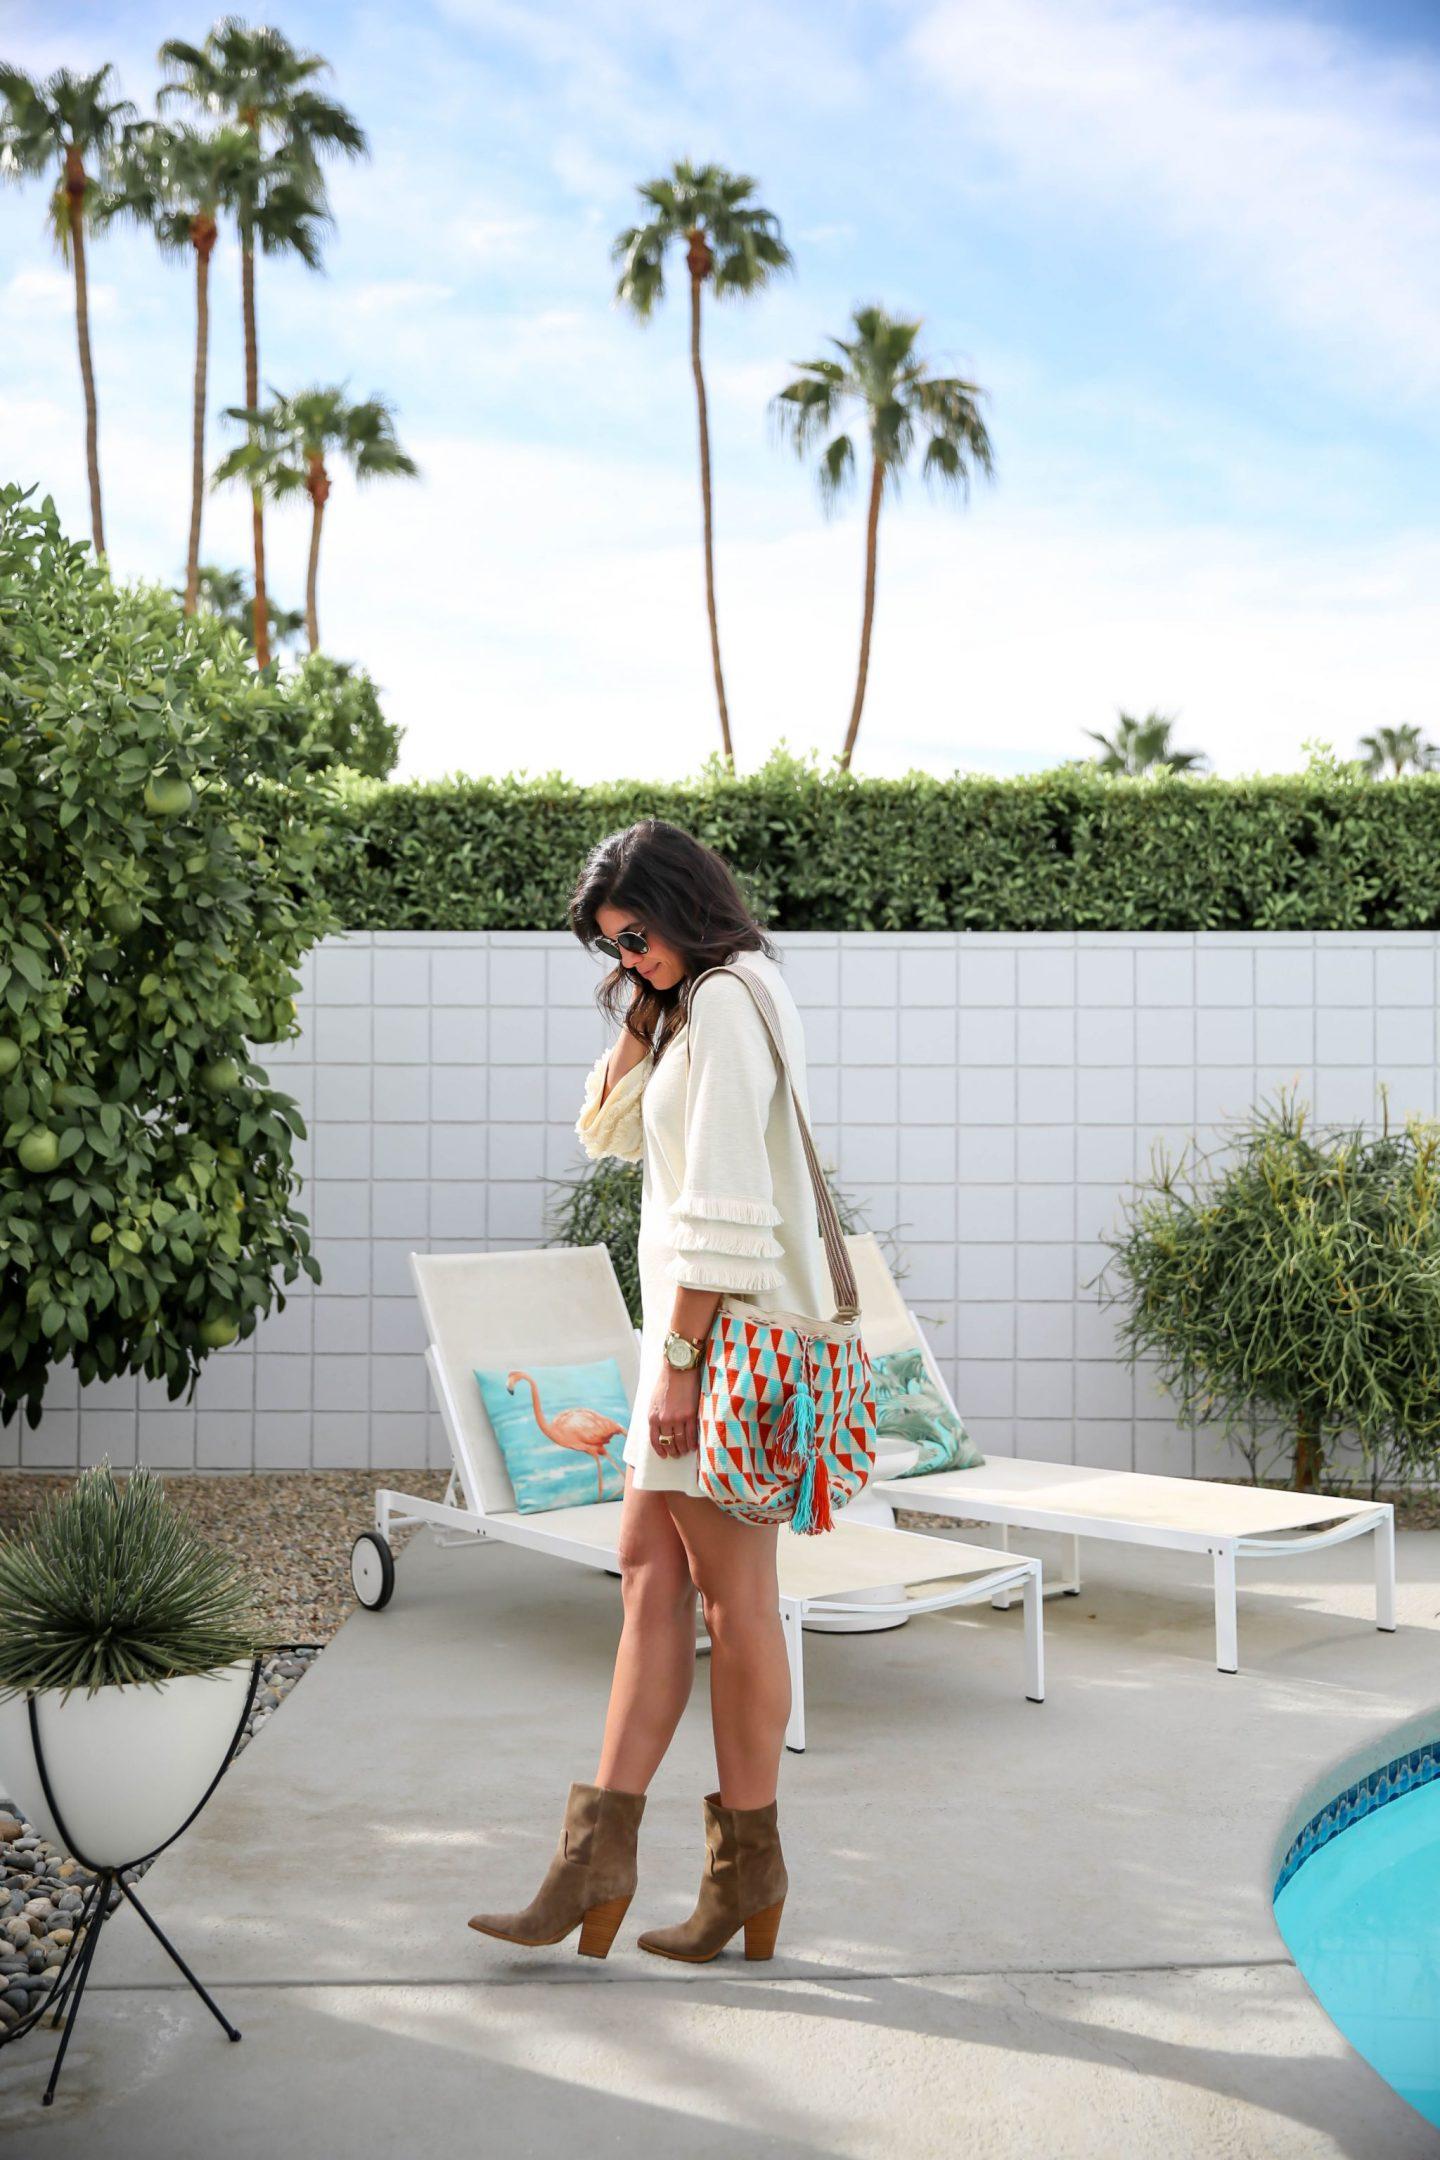 boho chic outfit inspiration - Lauren schwaiger style blog